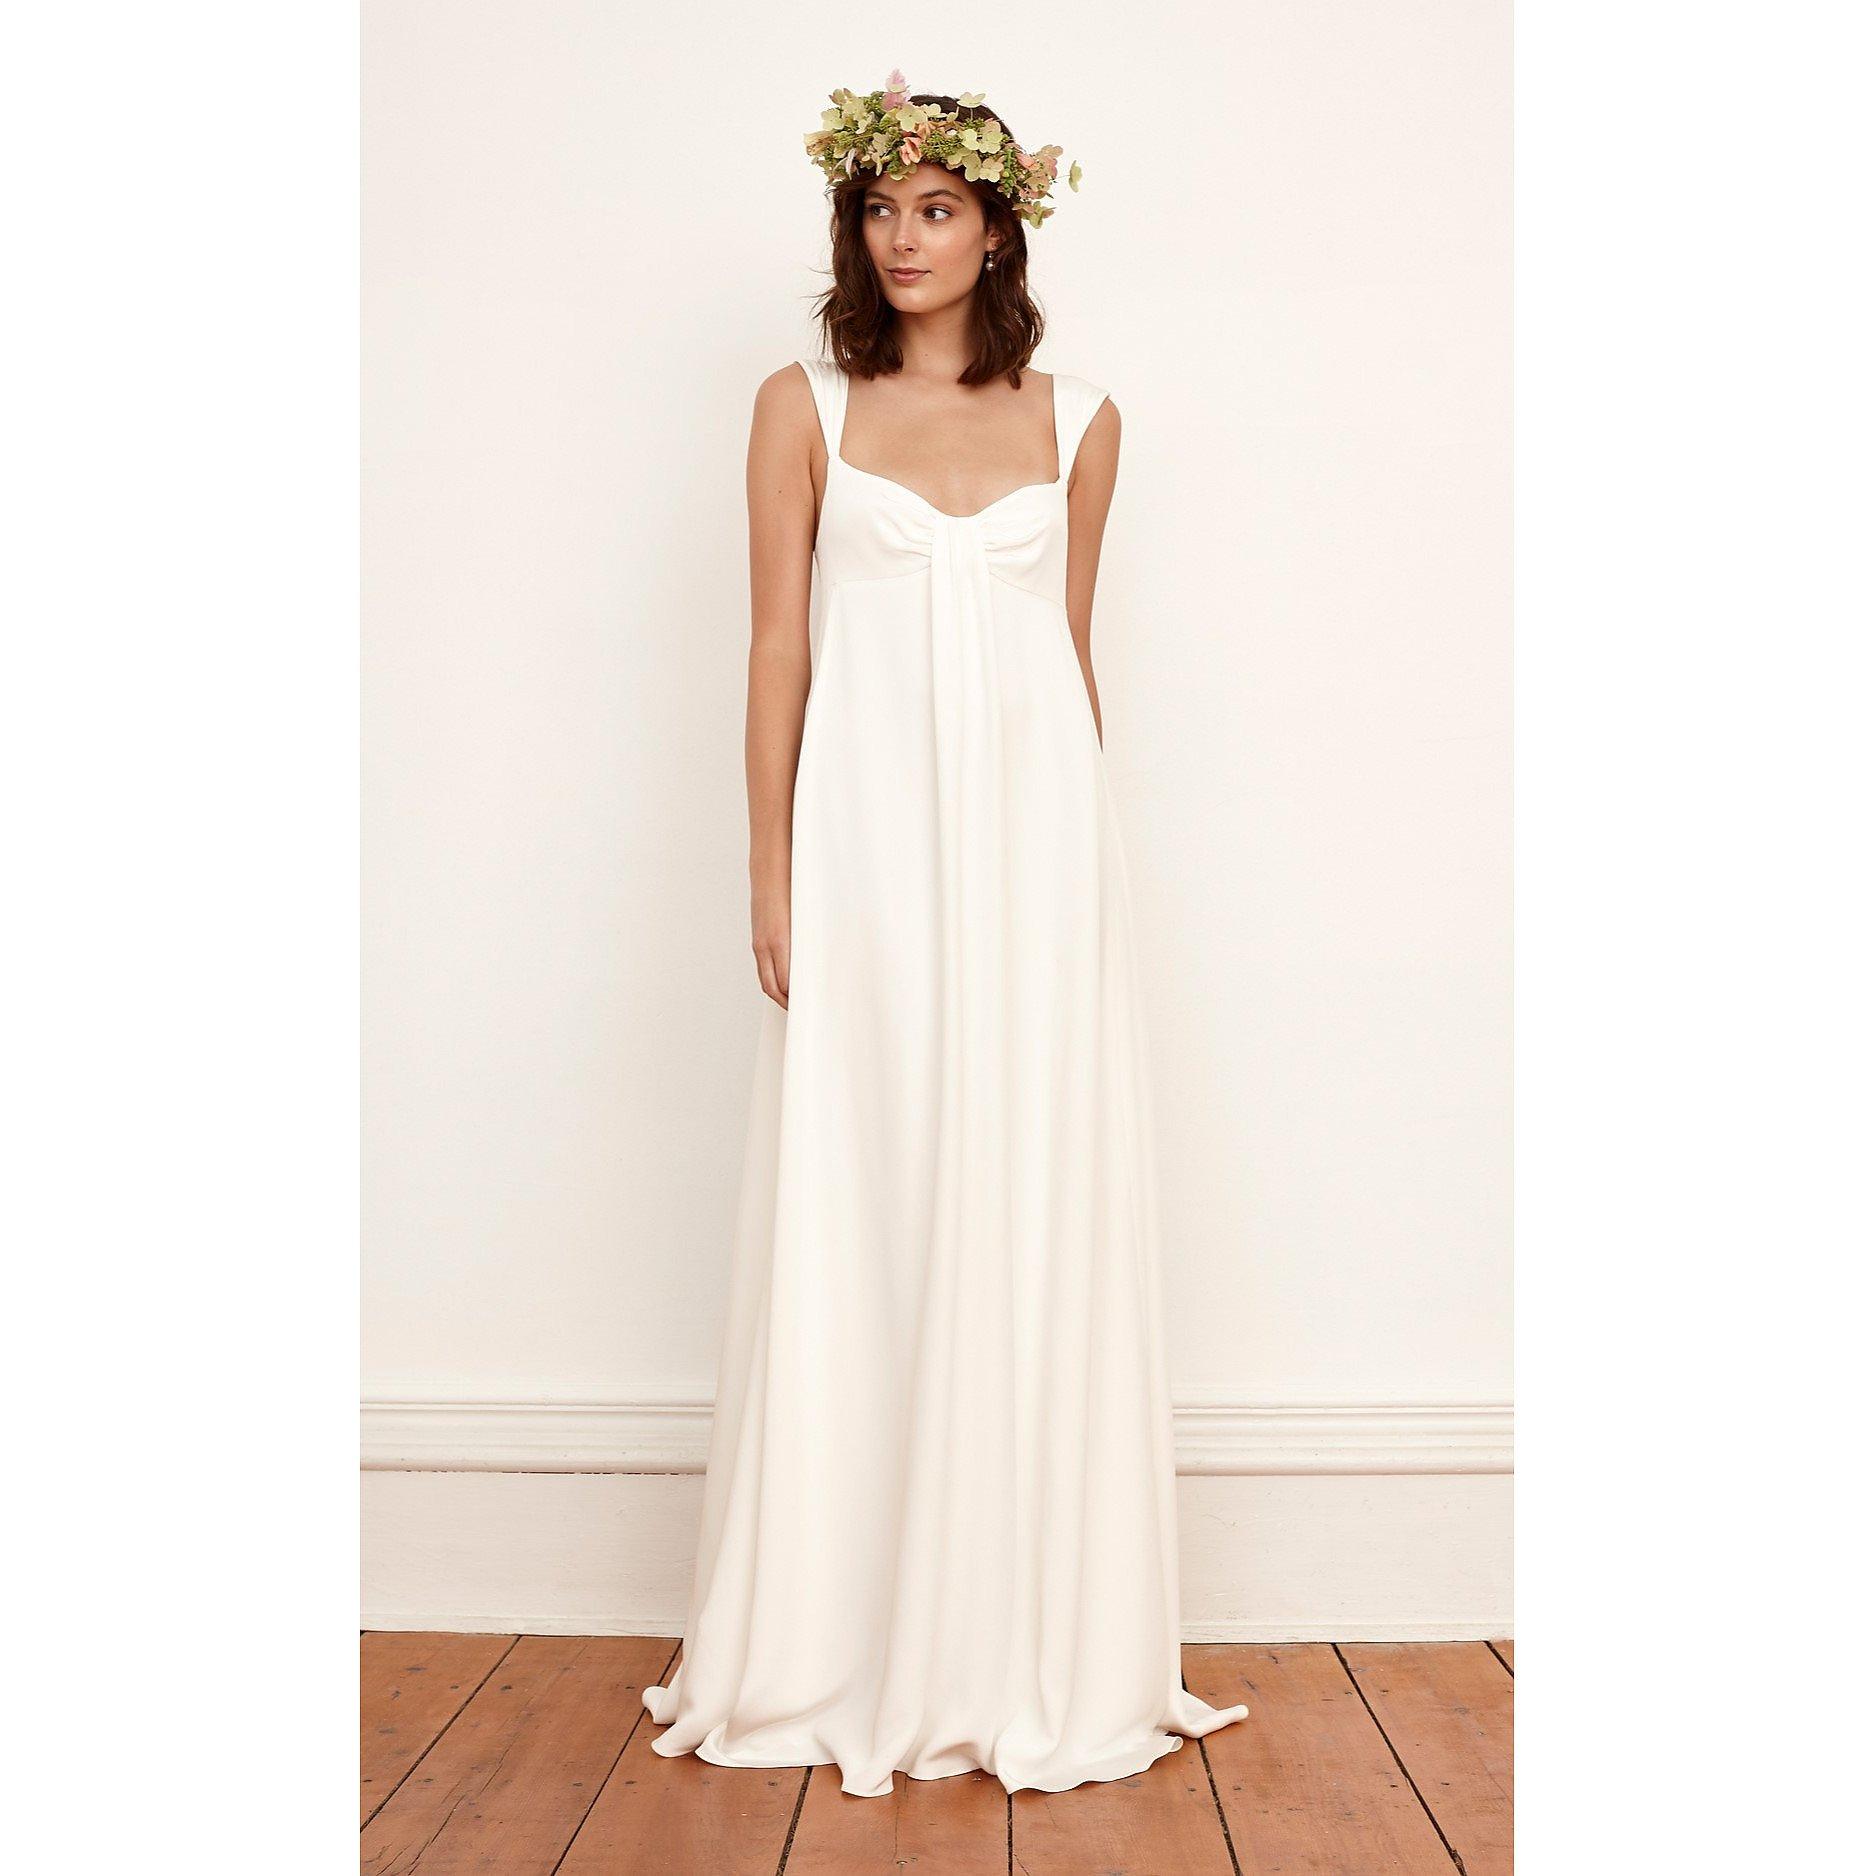 Savannah Miller Georgina Bridal Dress